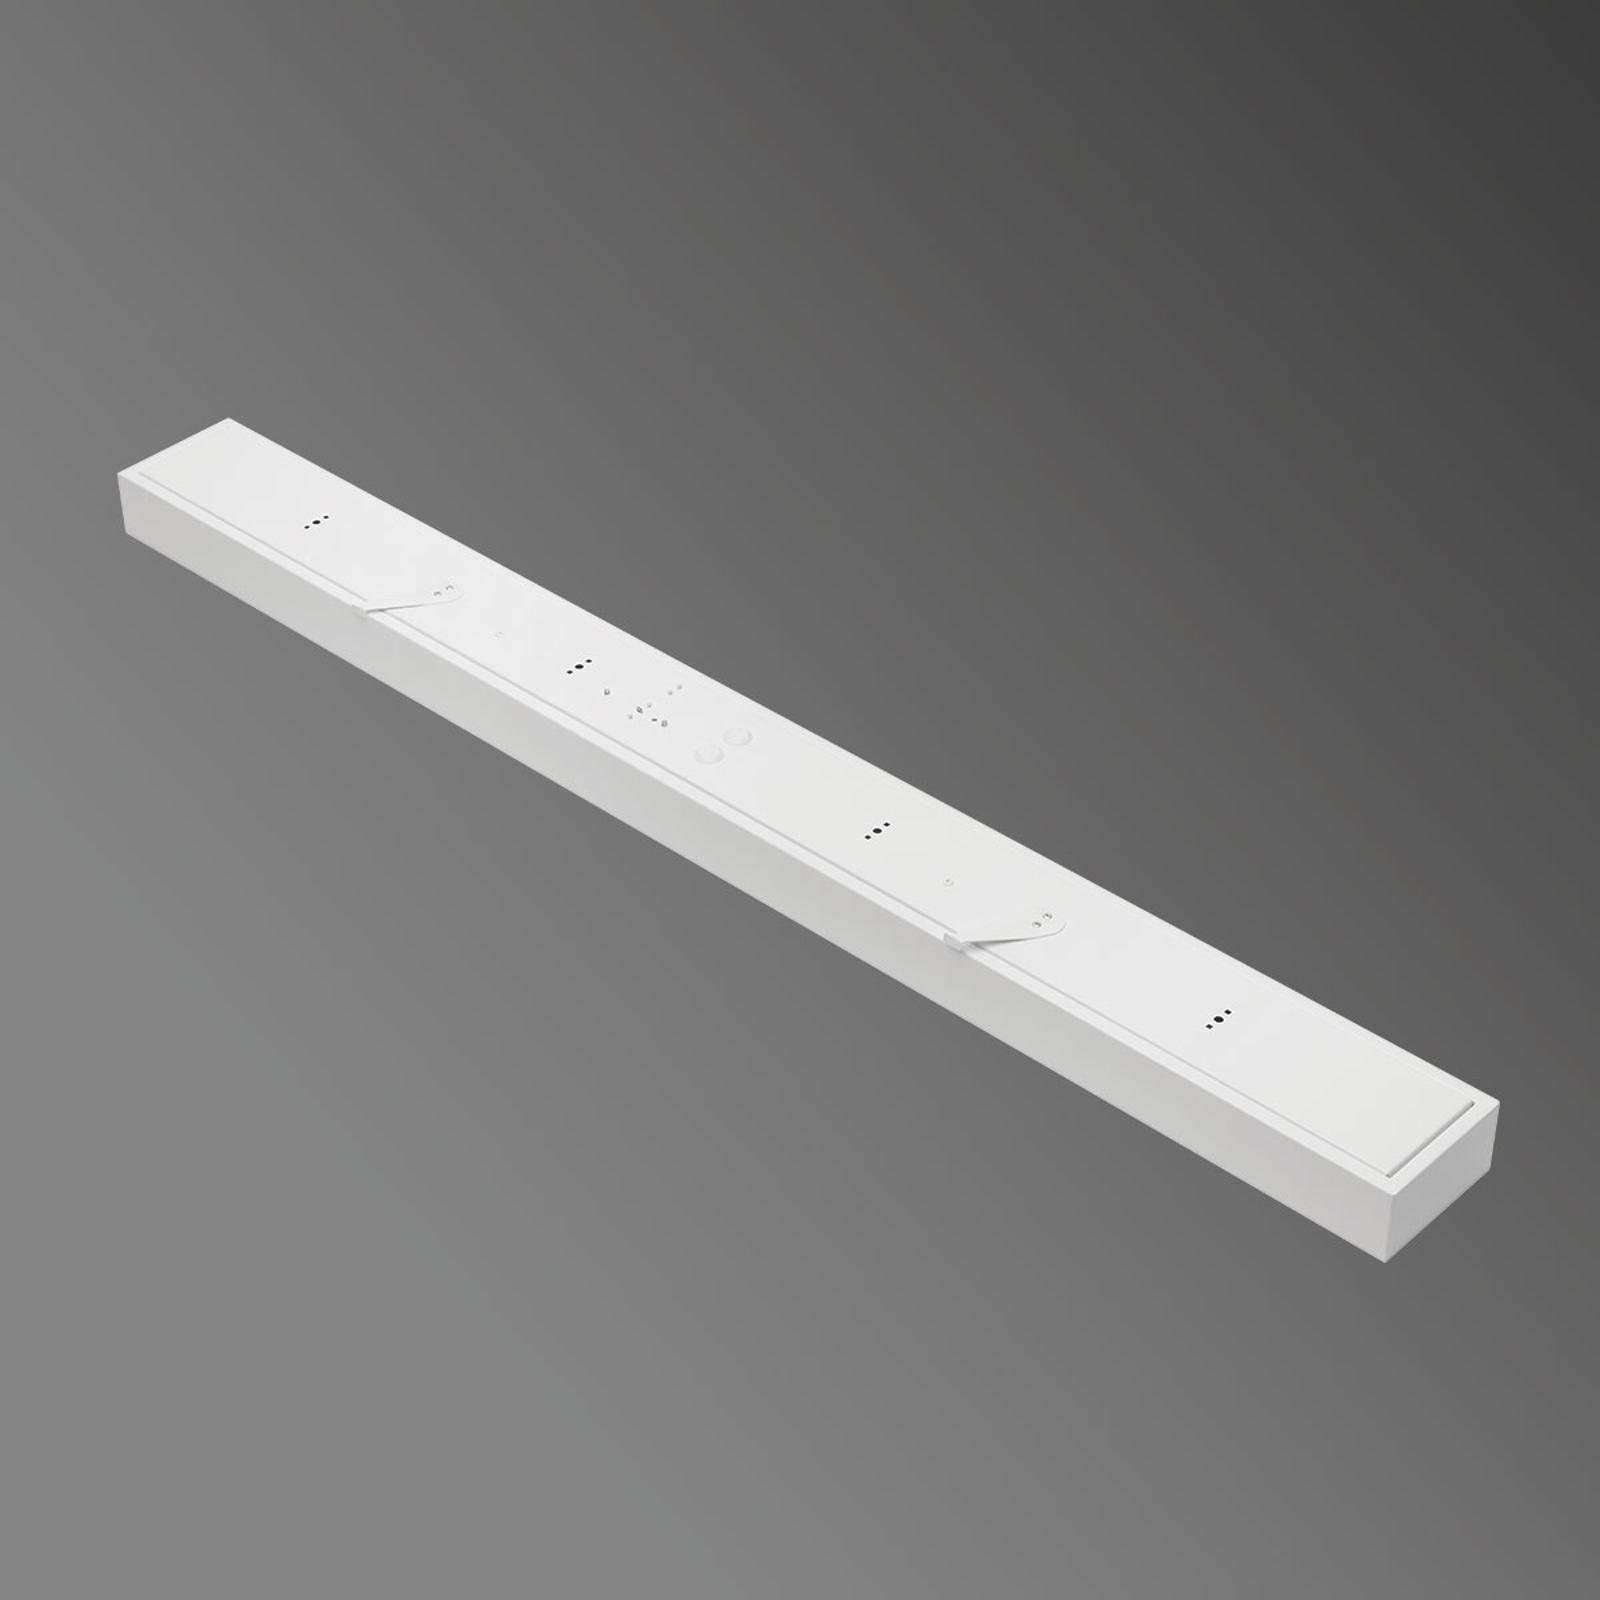 Lambda LED DIF SFD M LED-Deckenleuchte, 4.000K